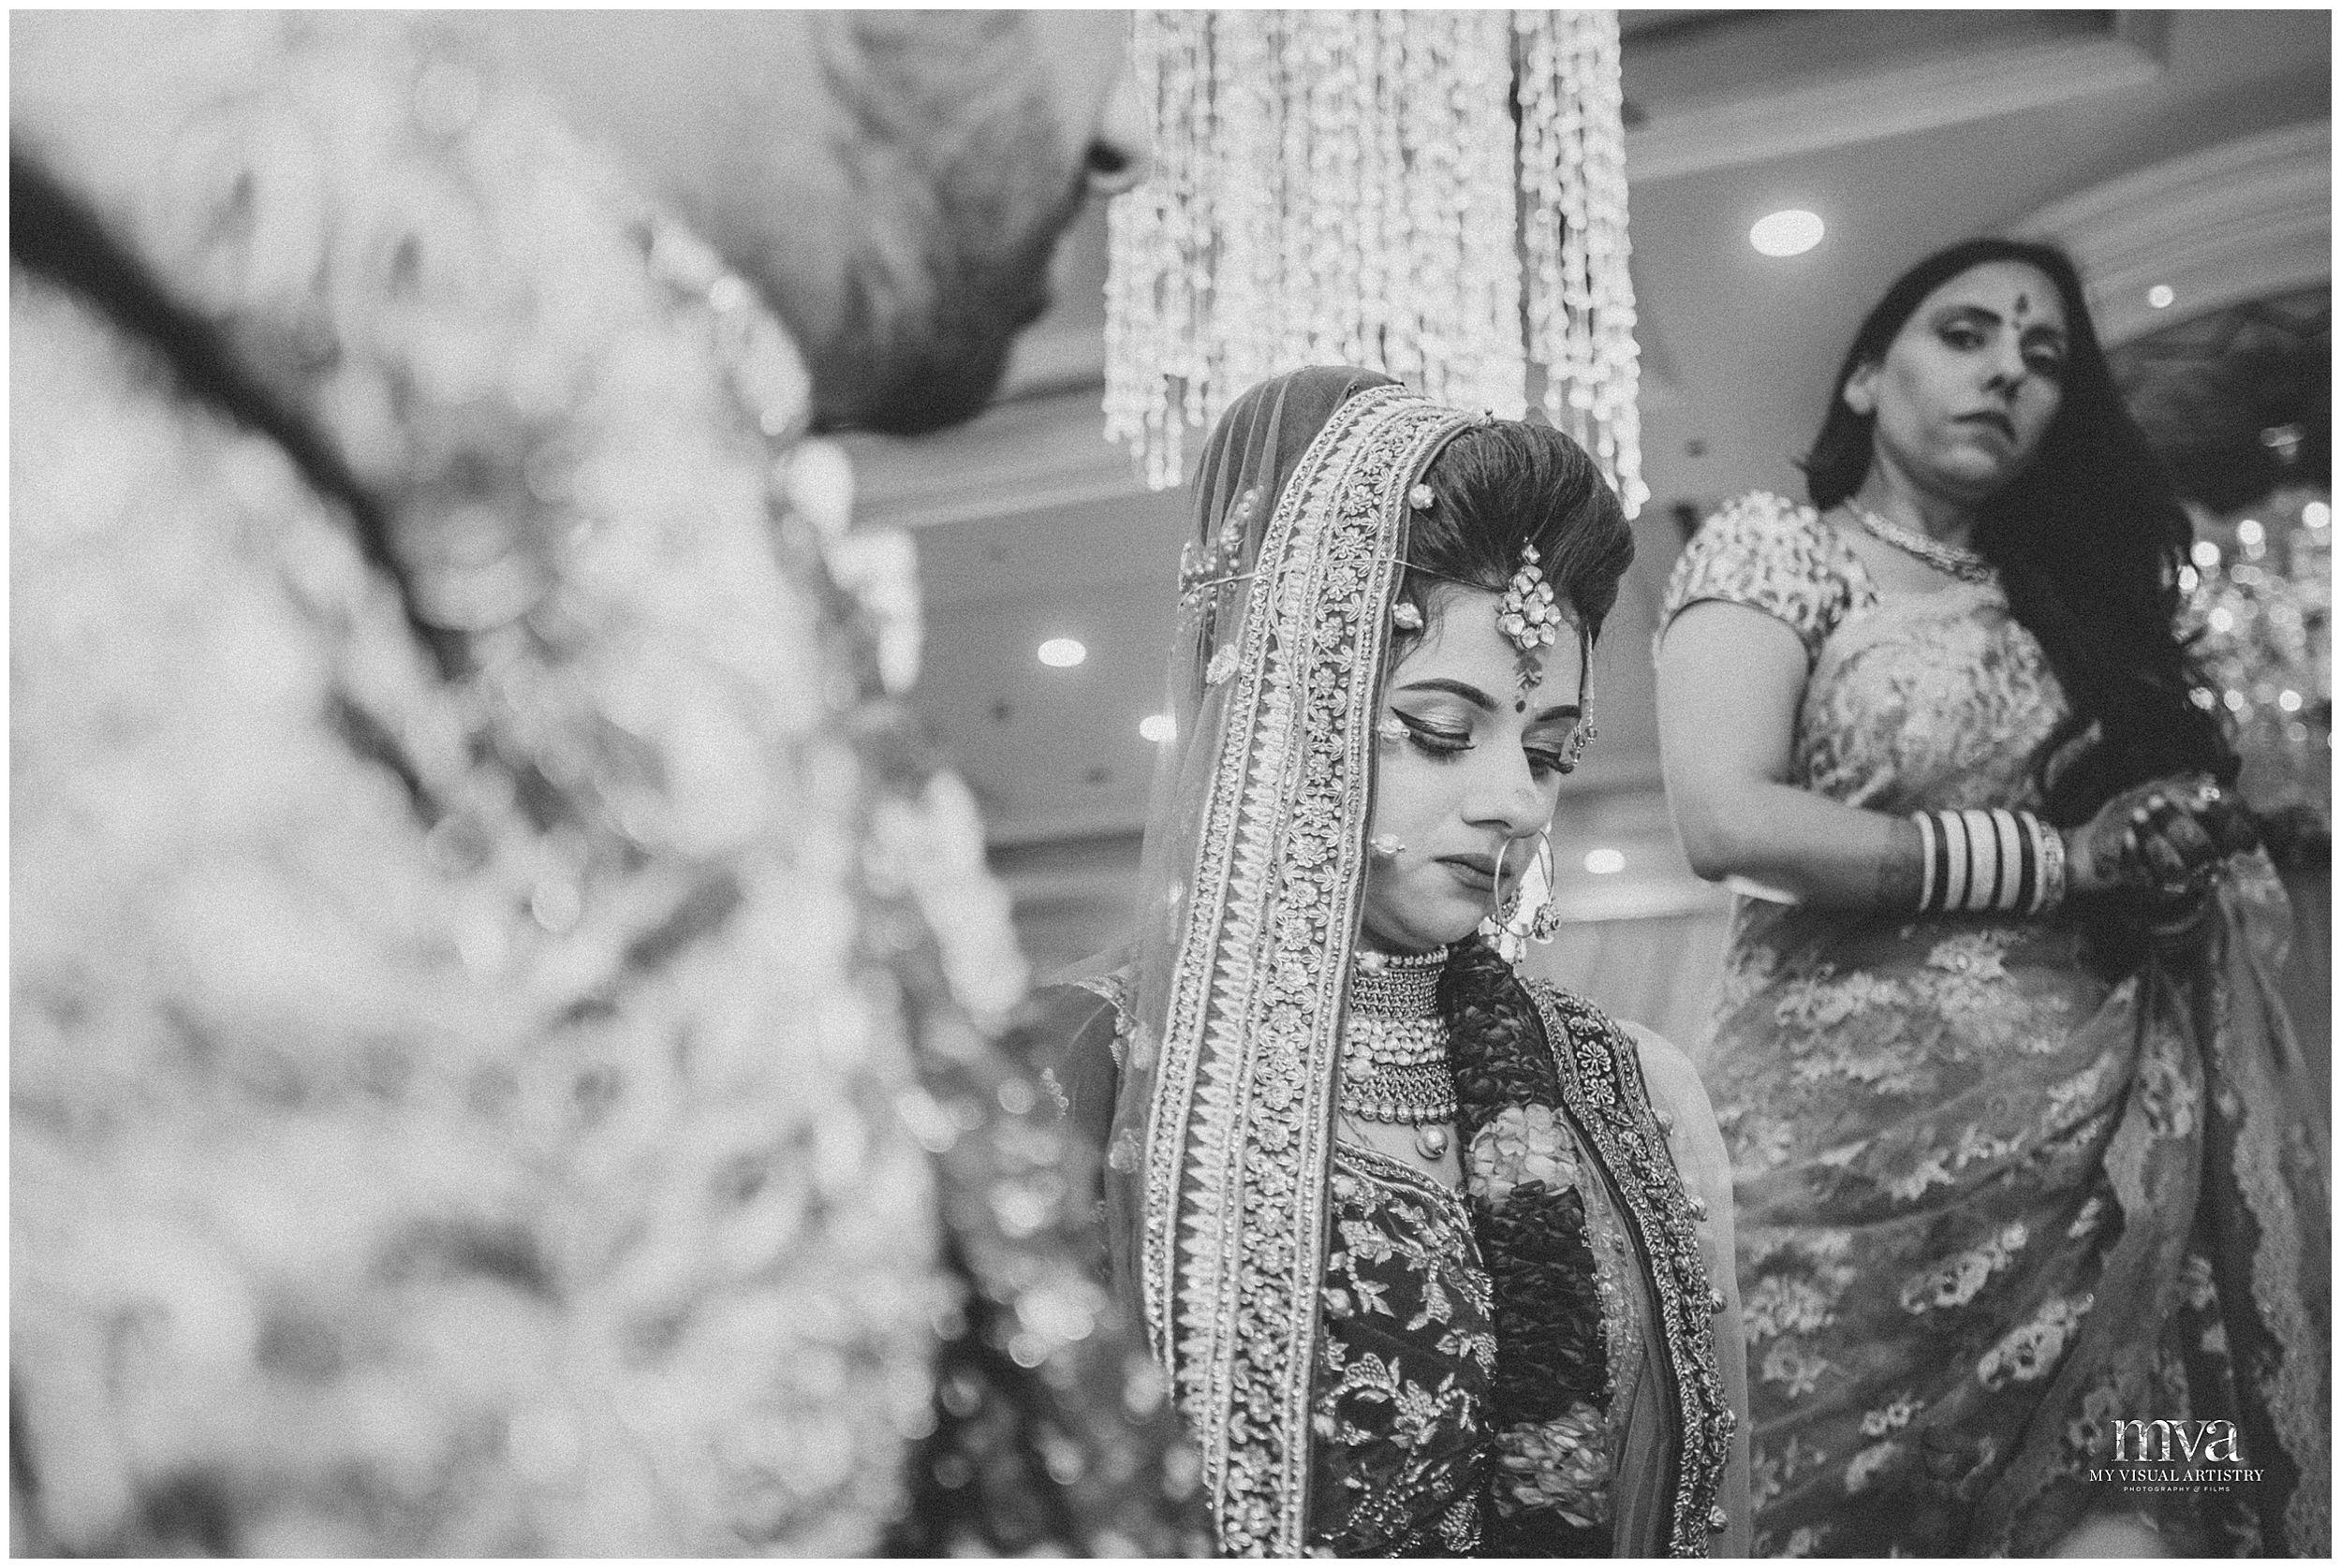 SONAAL_AMI_MYVISUALARTISTRY_WEDDING_PHOTOGRAPHY_MVA_NEPAL_KATHMANDU_SOALTEE67.jpg